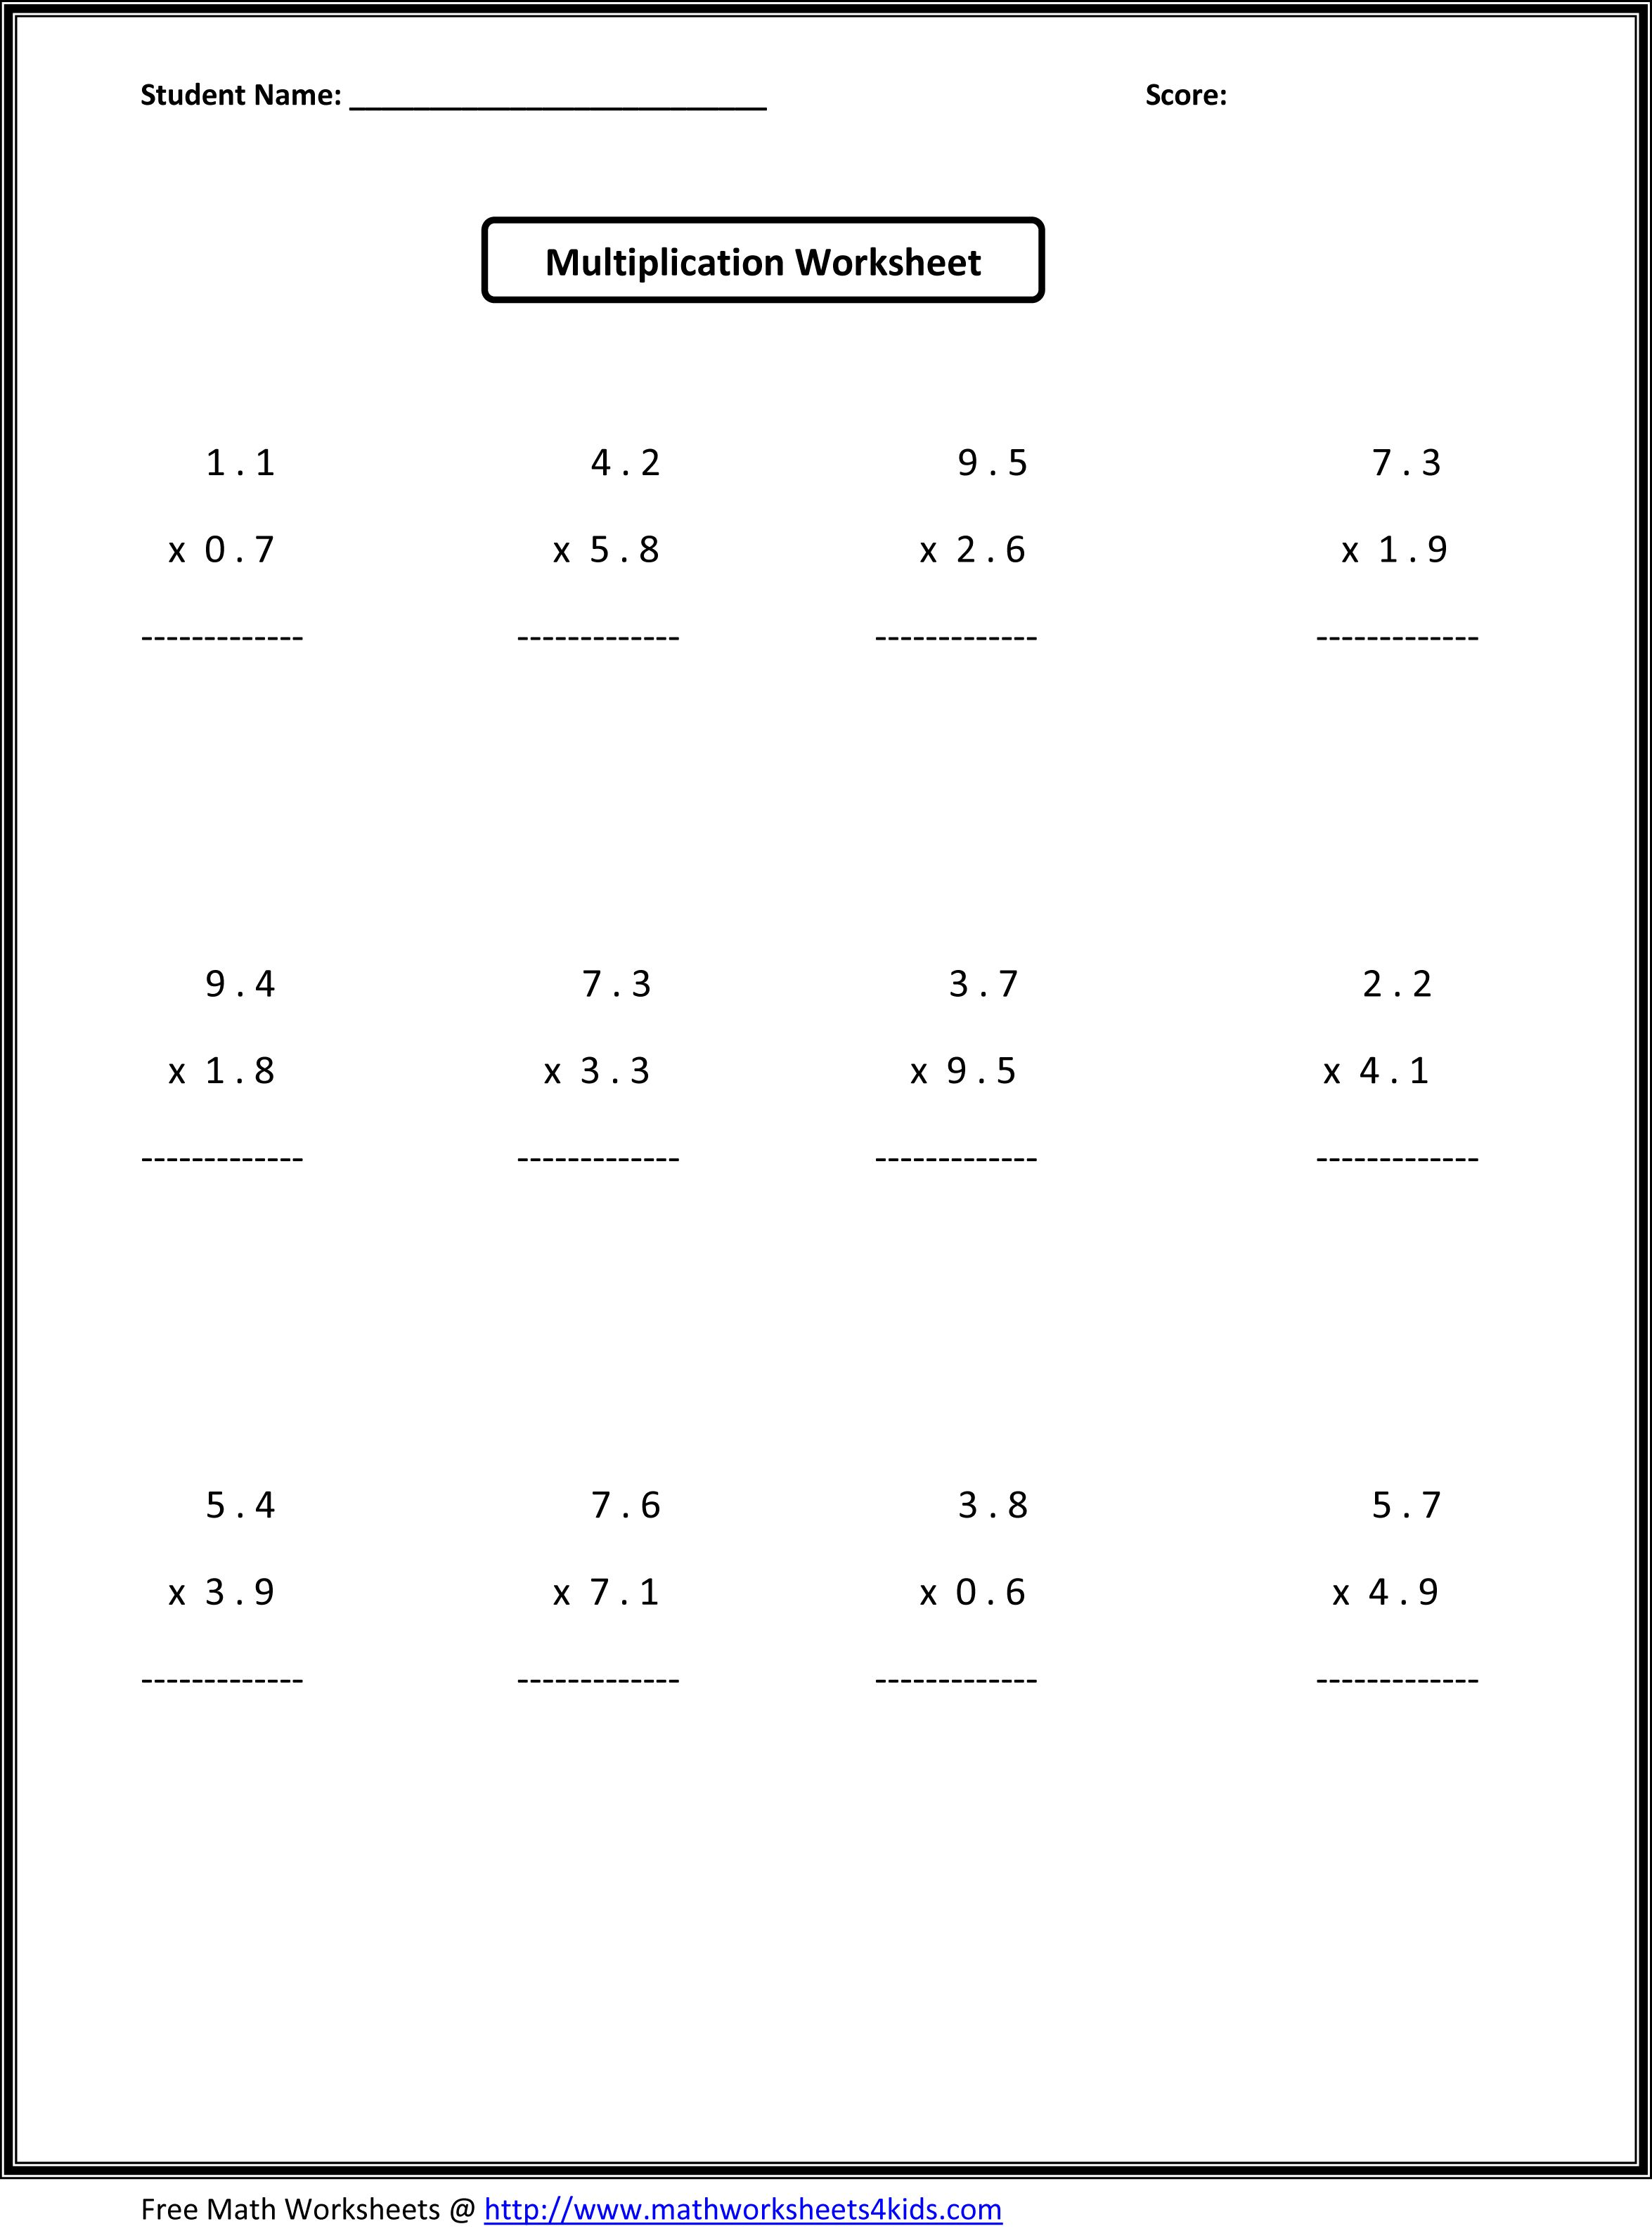 Sixth Grade Math Worksheets   7th grade math worksheets [ 3174 x 2350 Pixel ]